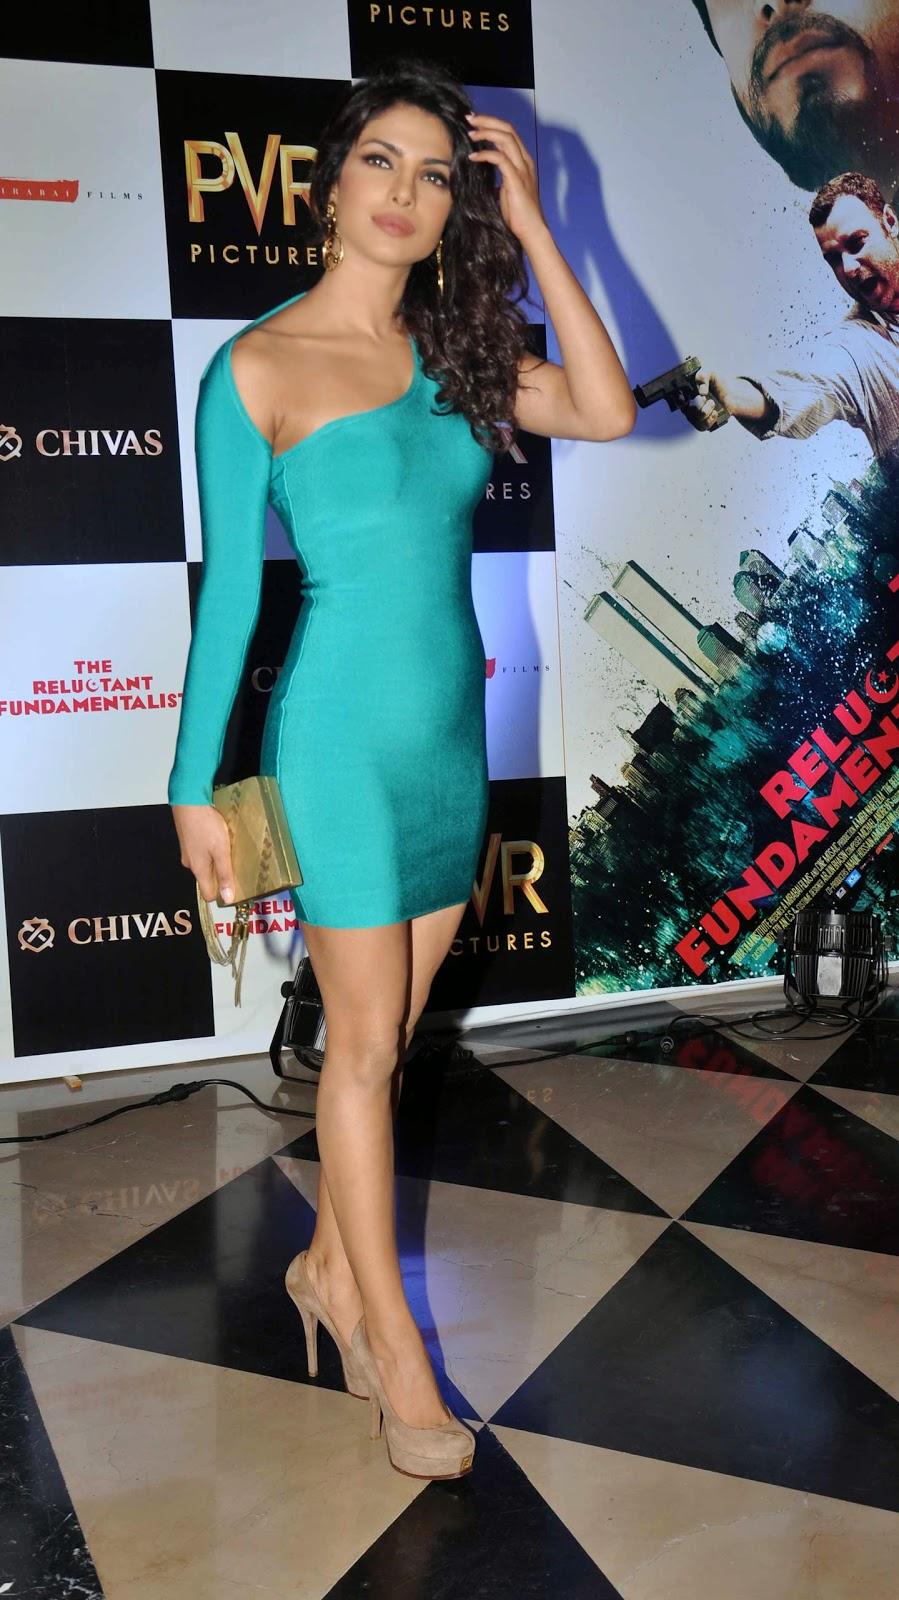 priyanka-chopra-in-tight-blue-mini-dress-flaunting-her-toned-body